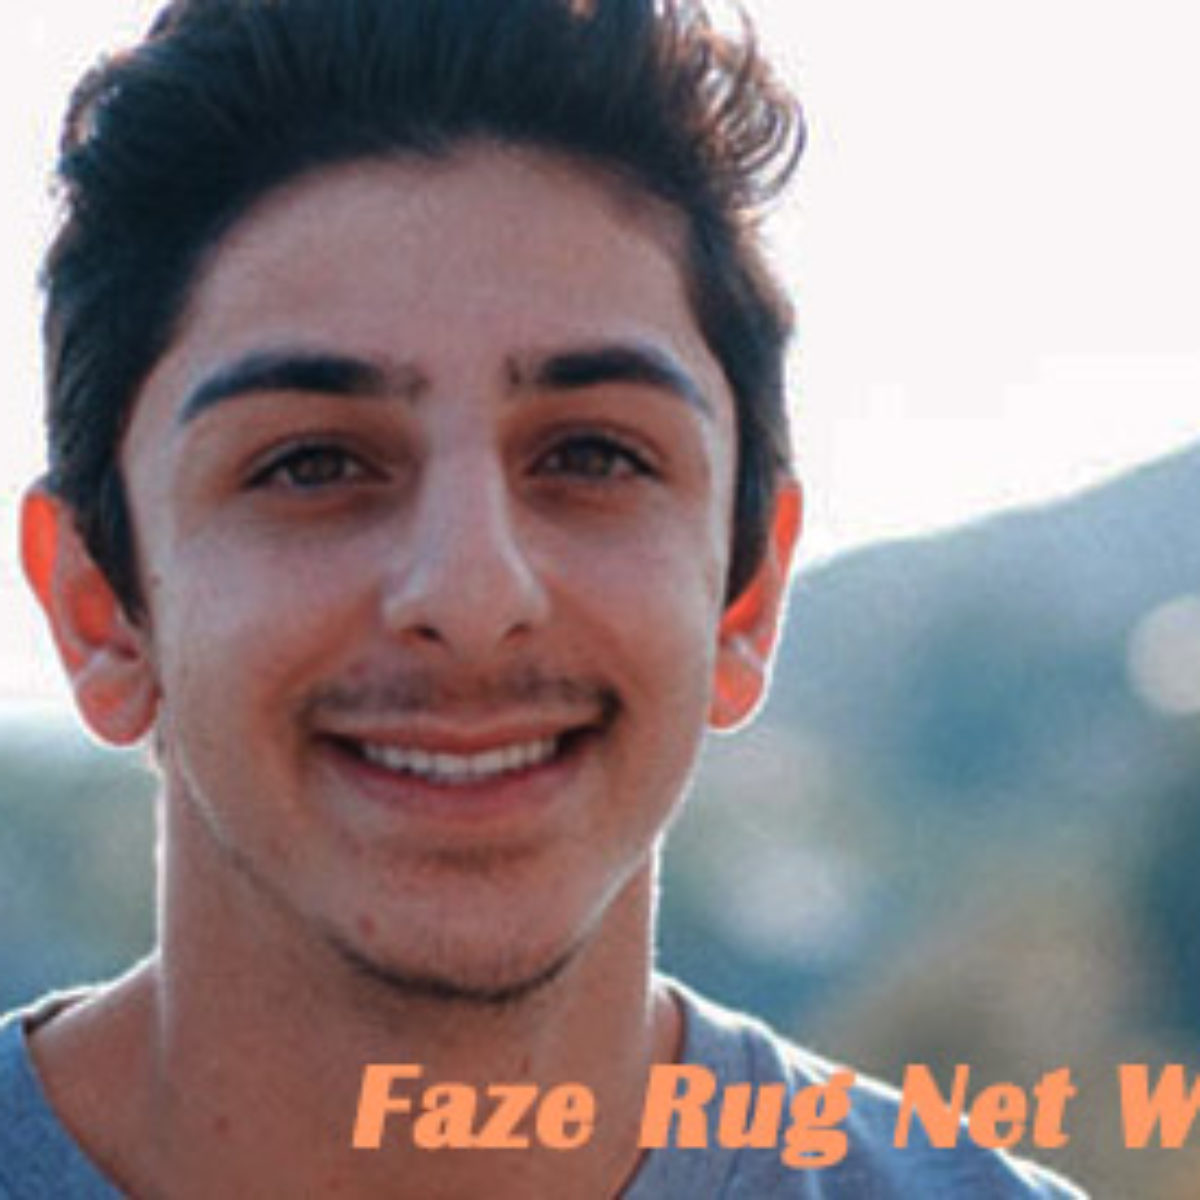 Faze Rug Net Worth. - Celebrity Net